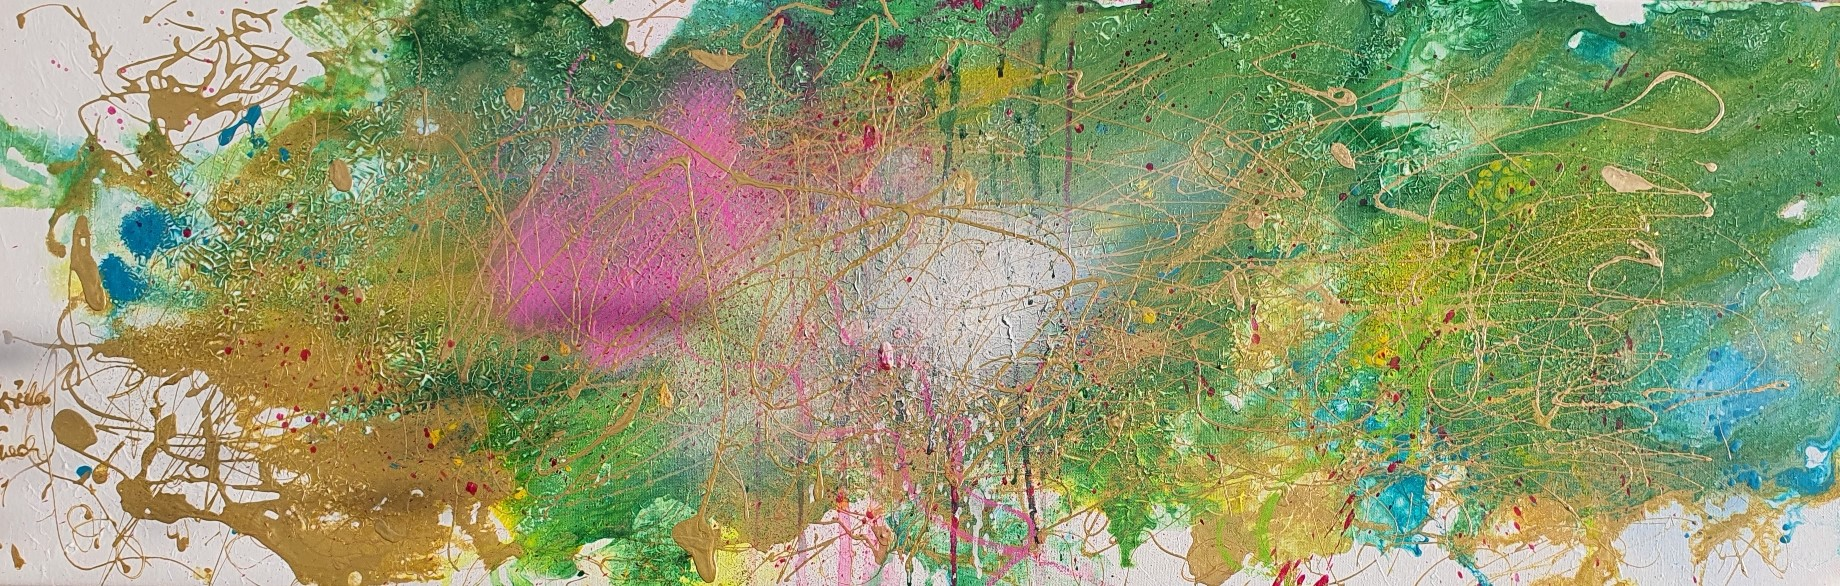 The world after Corona  (Acryl/Mixed Media on Canvas 40 X 1,5 X 120 cm)